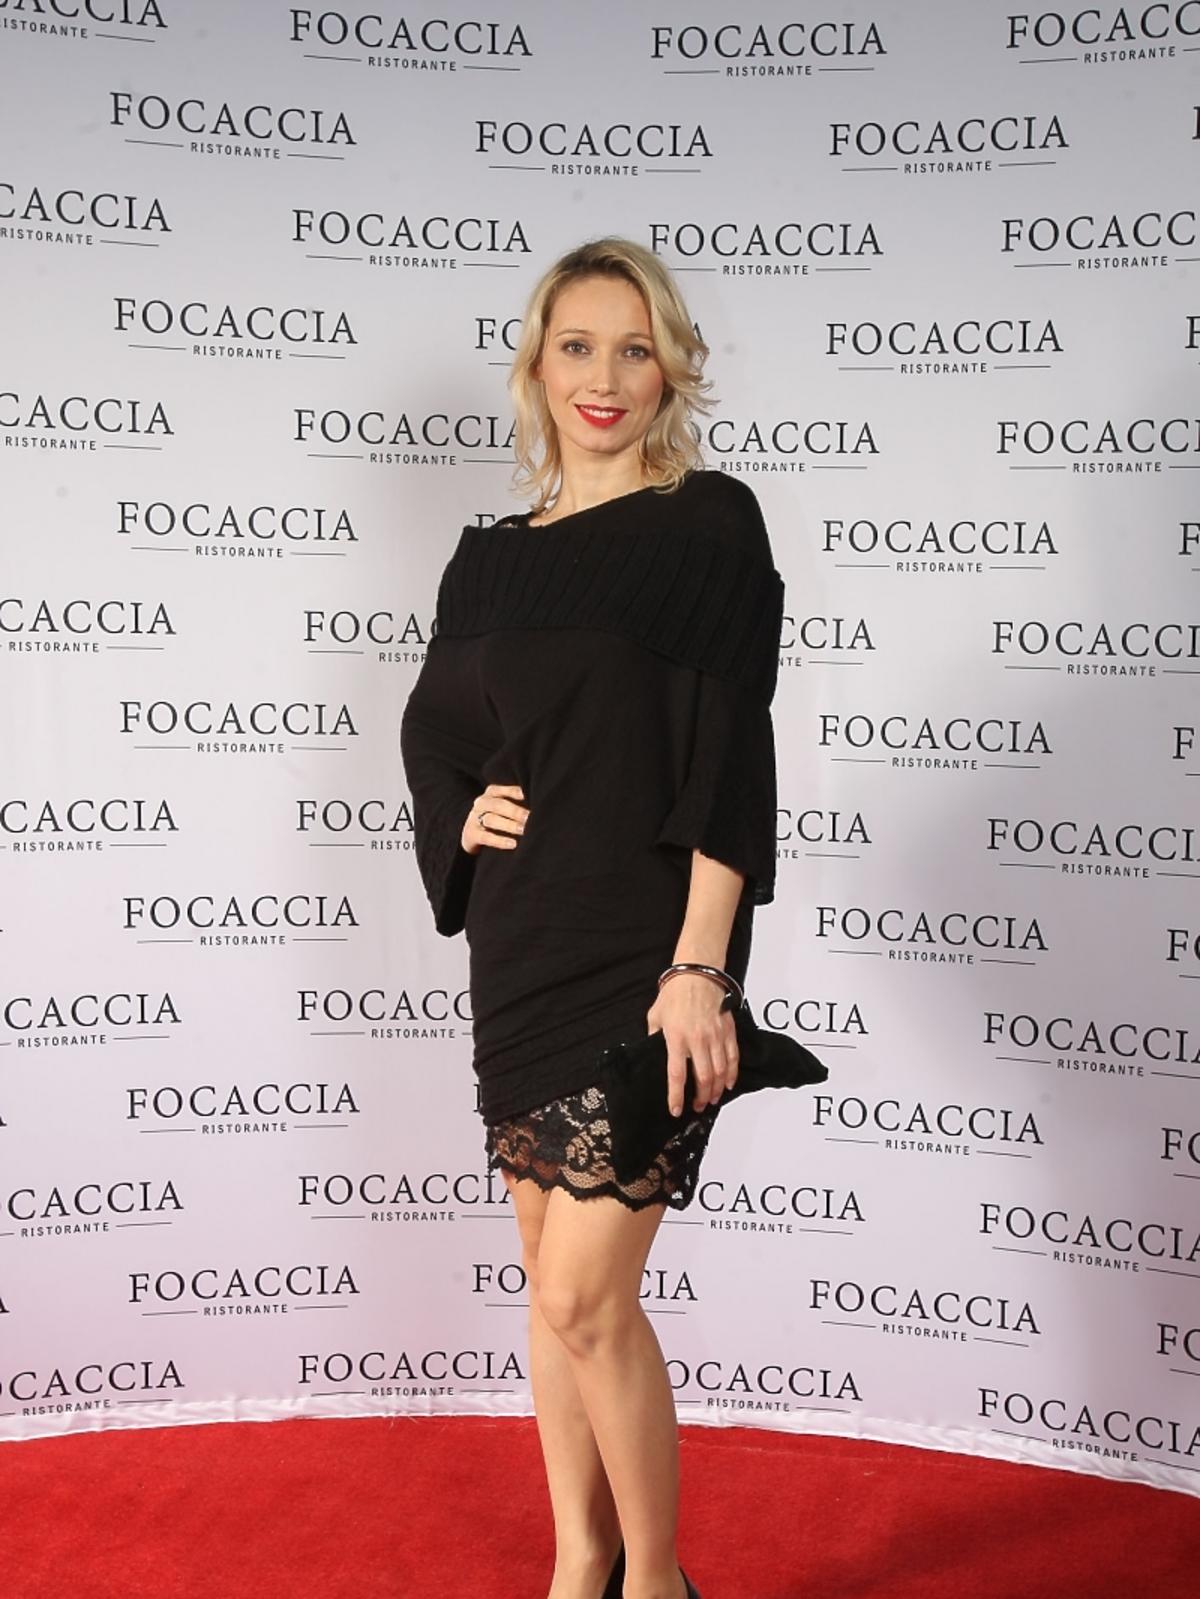 Joanna Orleańska na otwarciu restauracji Focaccia